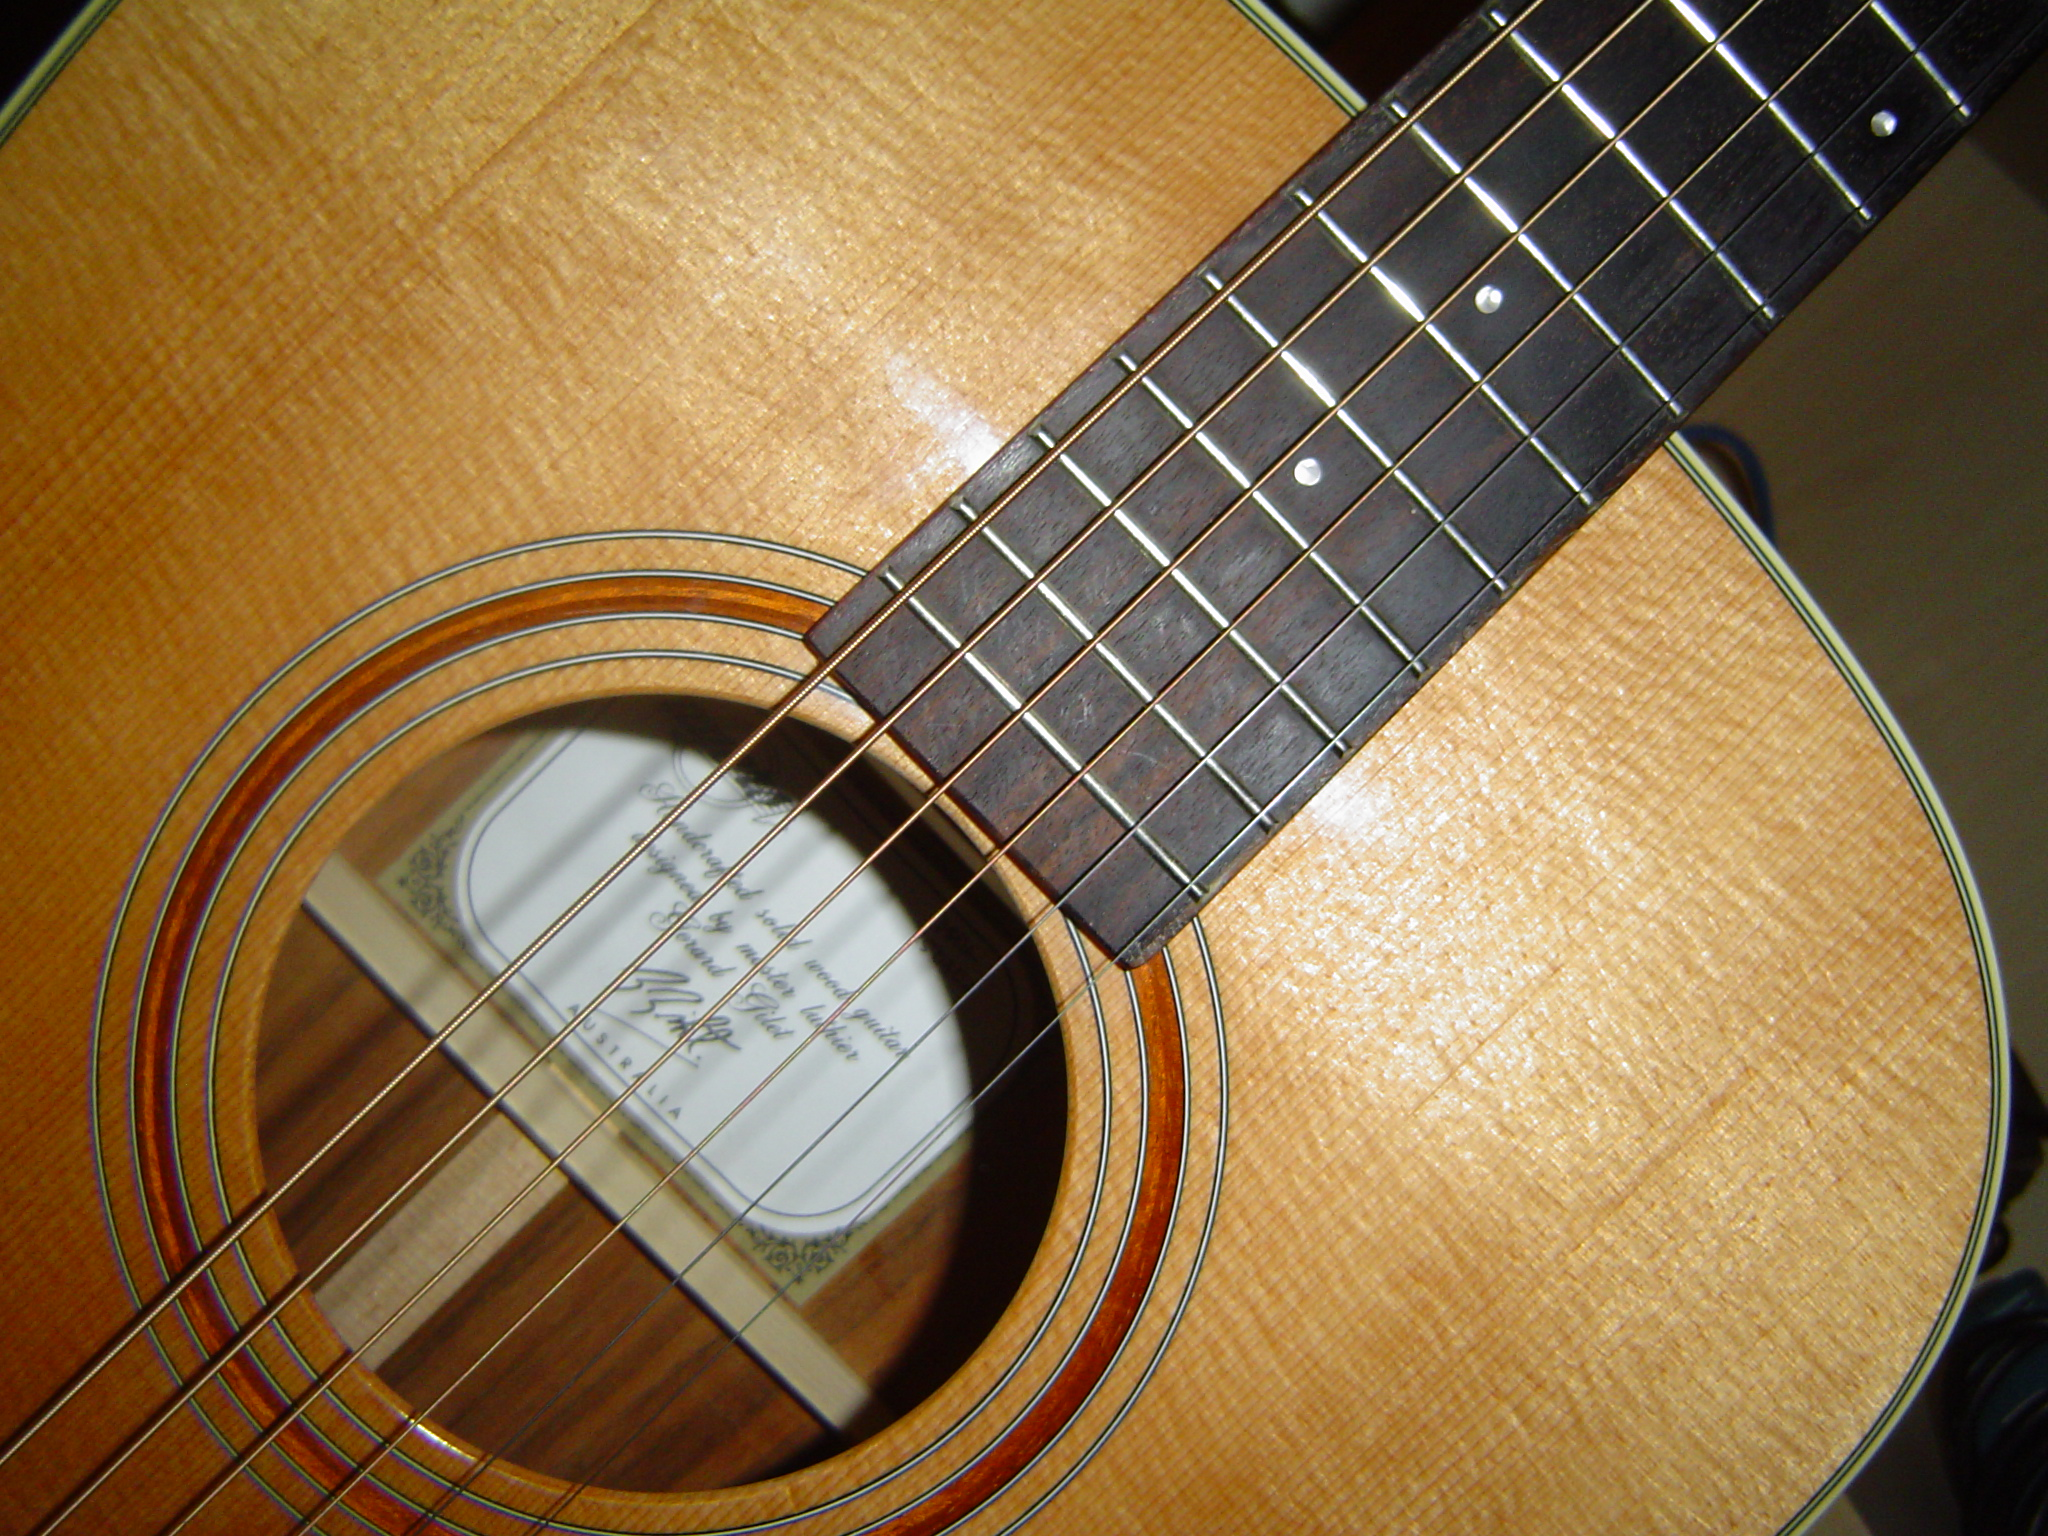 Blister Prevention Tip 5 - Select the right strings